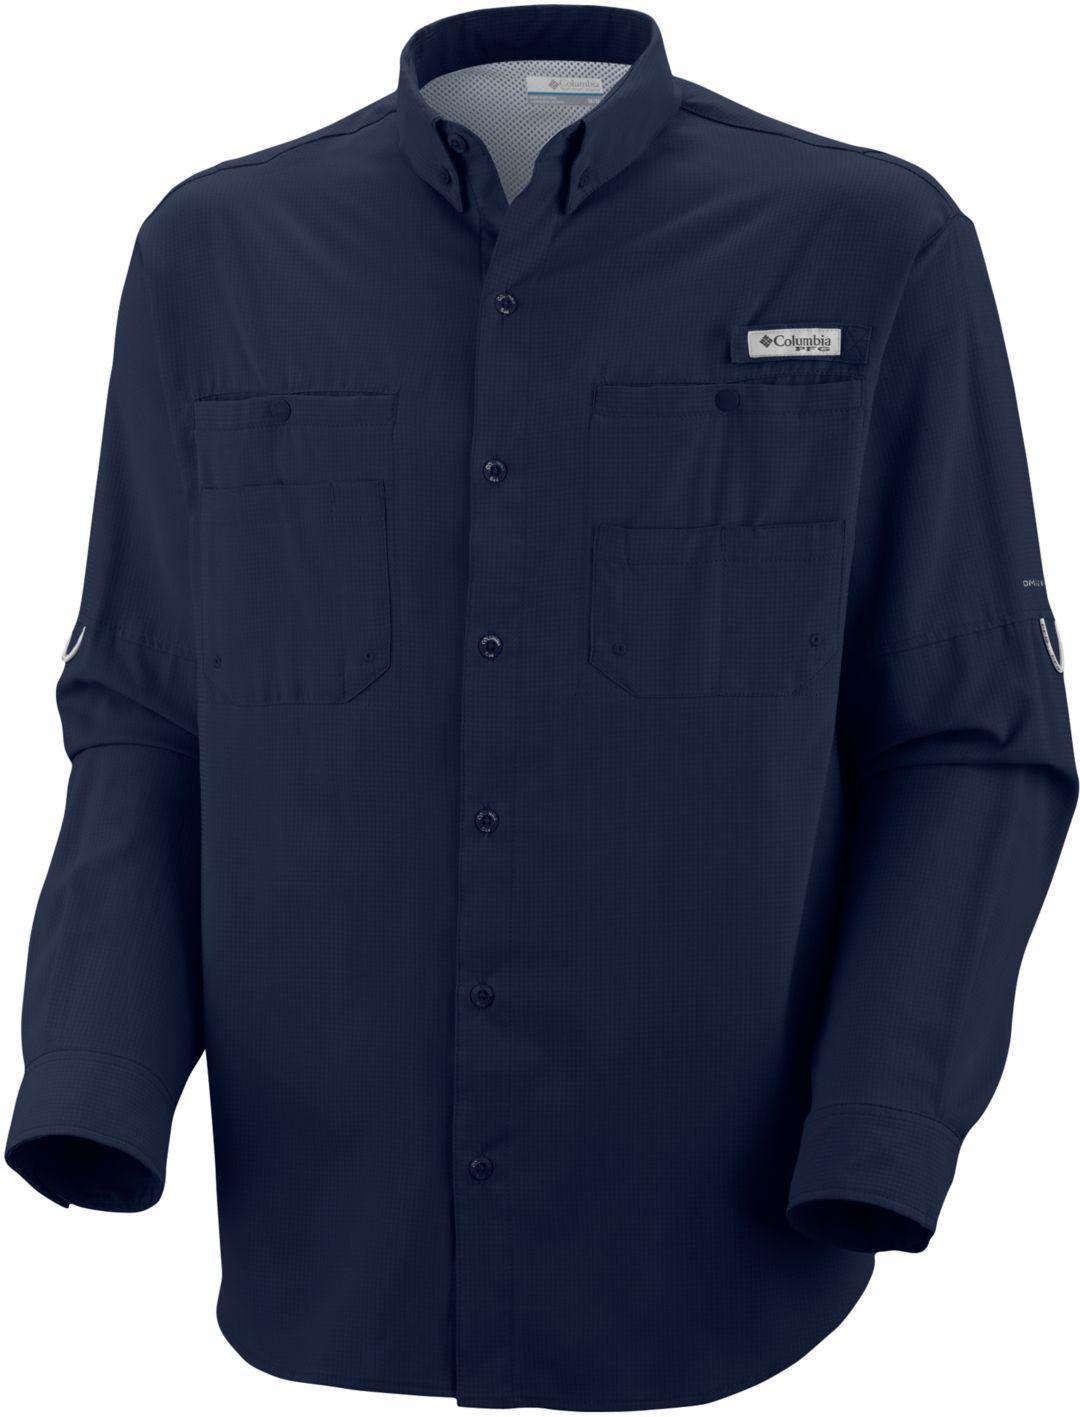 e844bc21 Columbia Men's PFG Tamiami II Long Sleeve Shirt. noImageFound. Previous